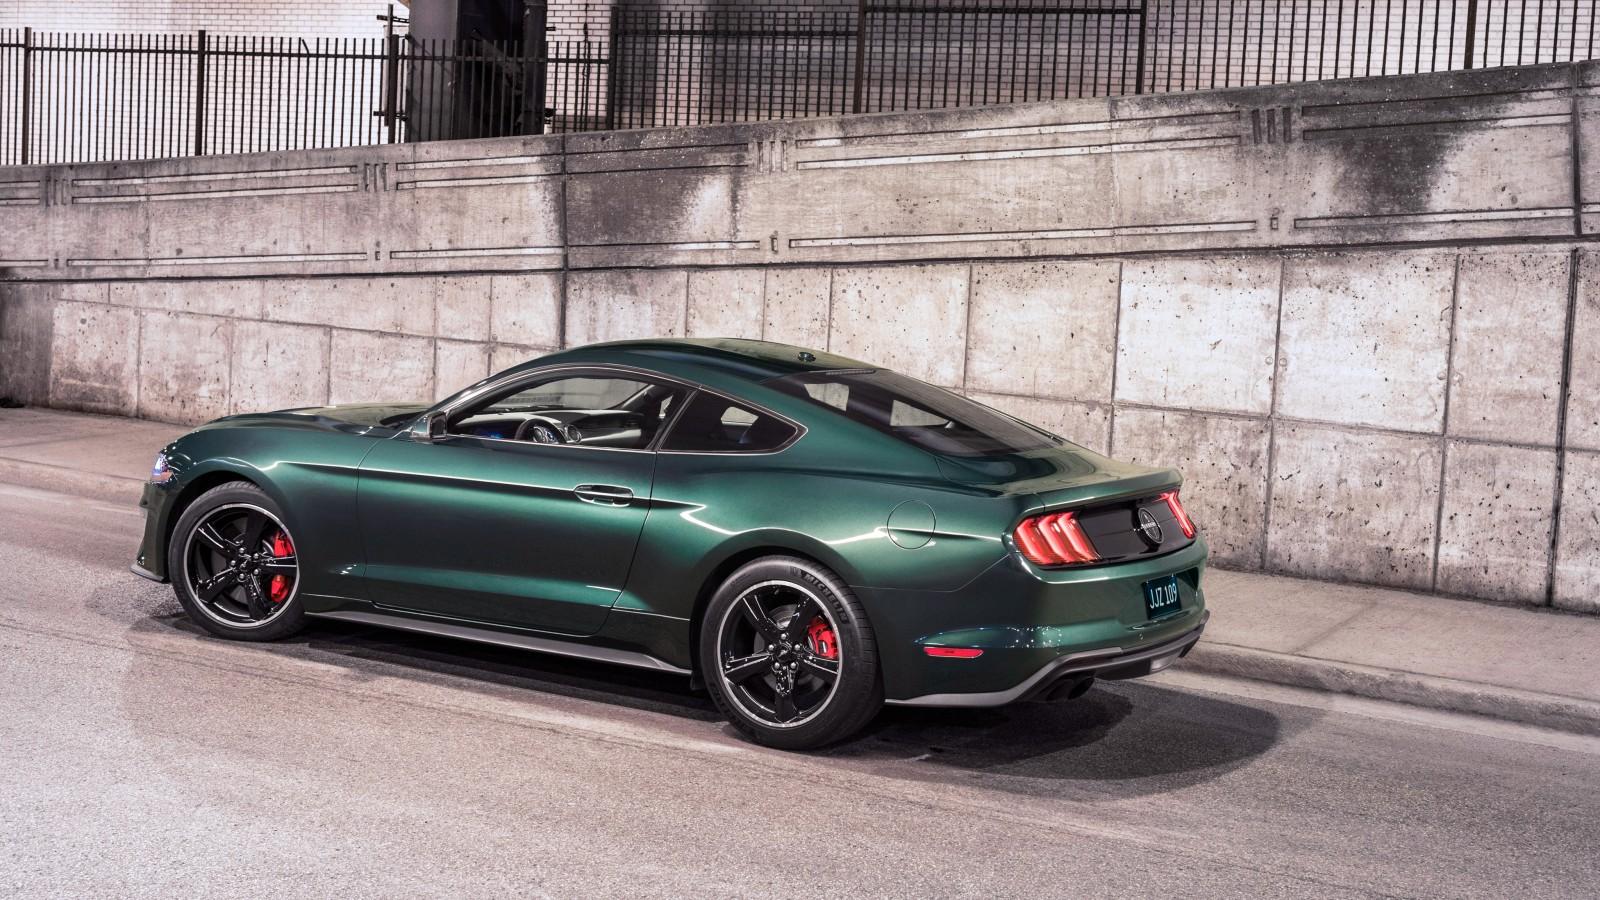 2019 Ford Mustang Bullitt 4K Wallpaper | HD Car Wallpapers ...